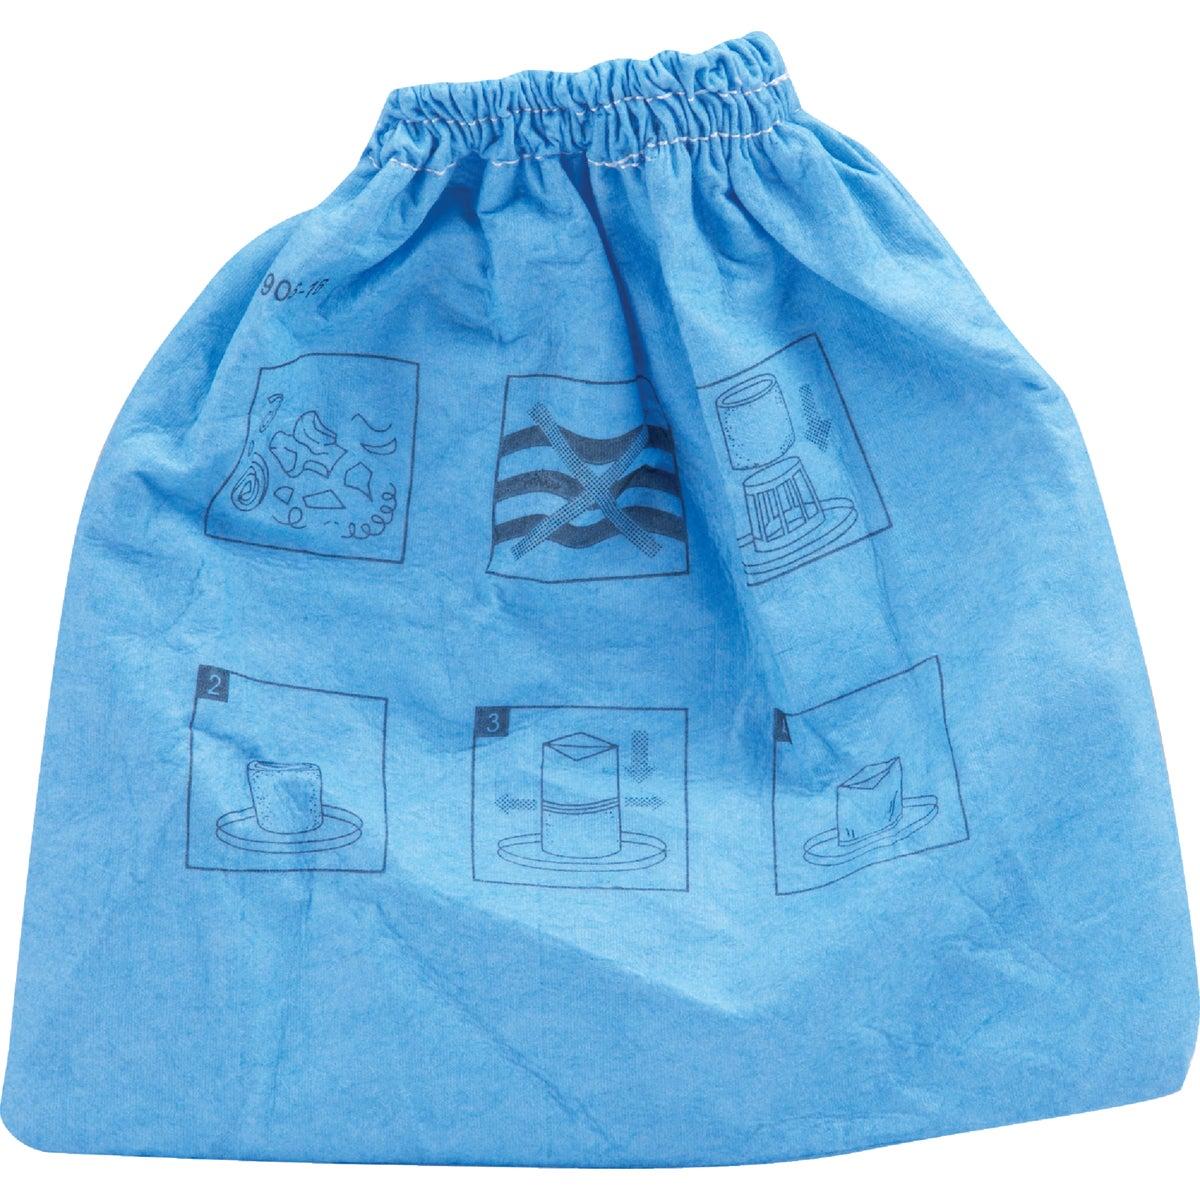 CLOTH FILTER BAG